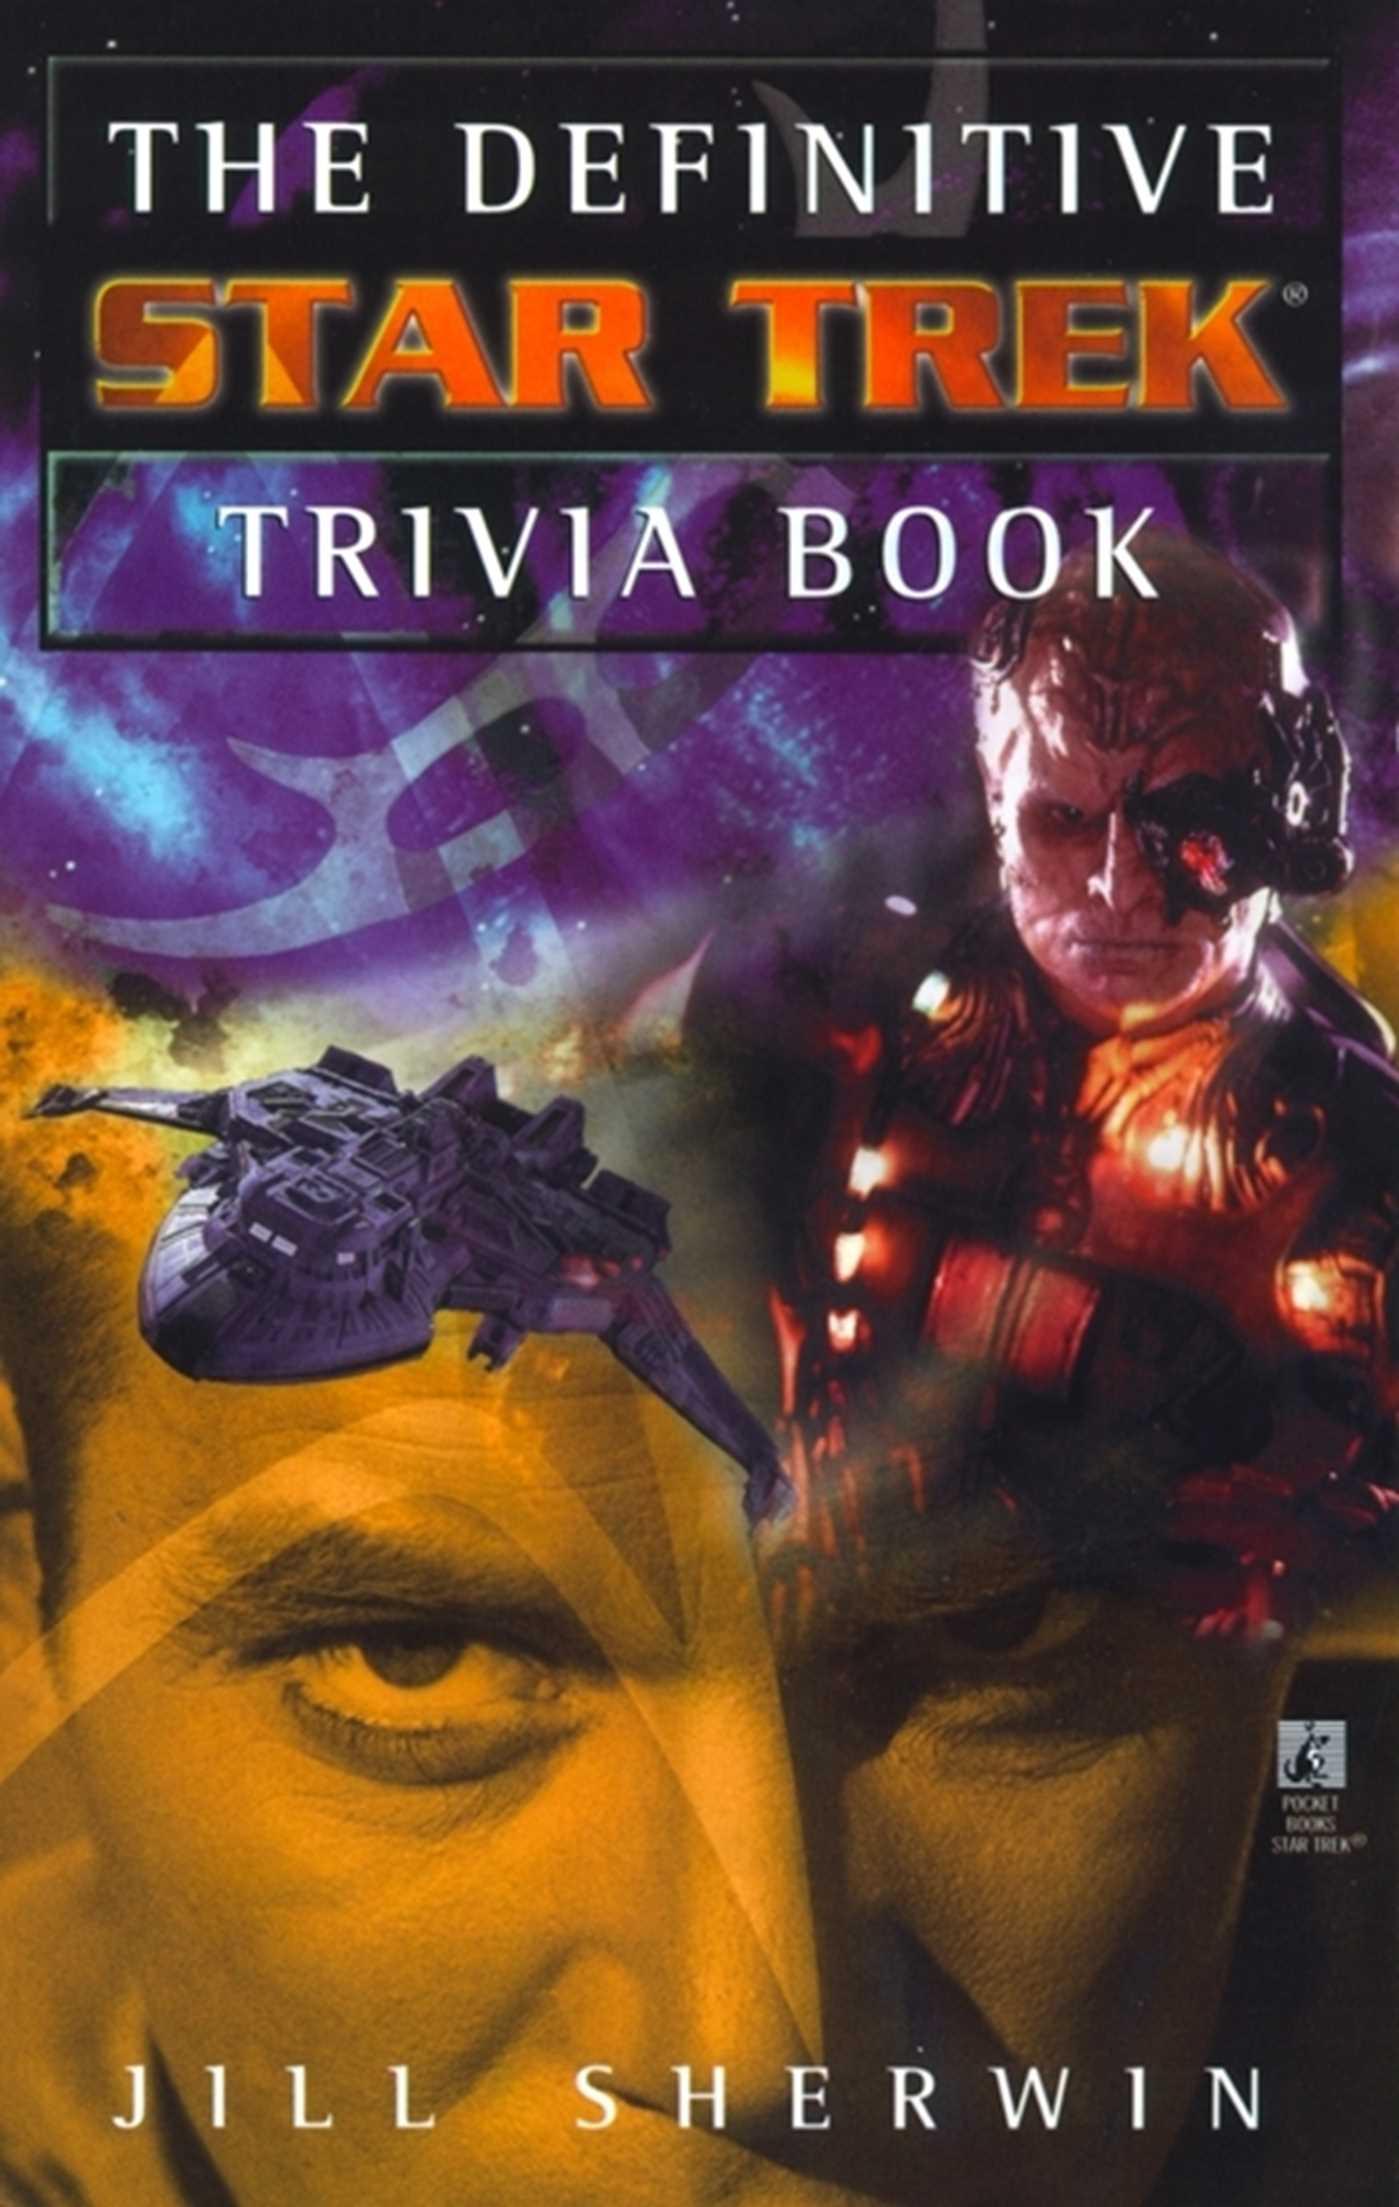 The definitive star trek trivia book volume i 9780743406710 hr